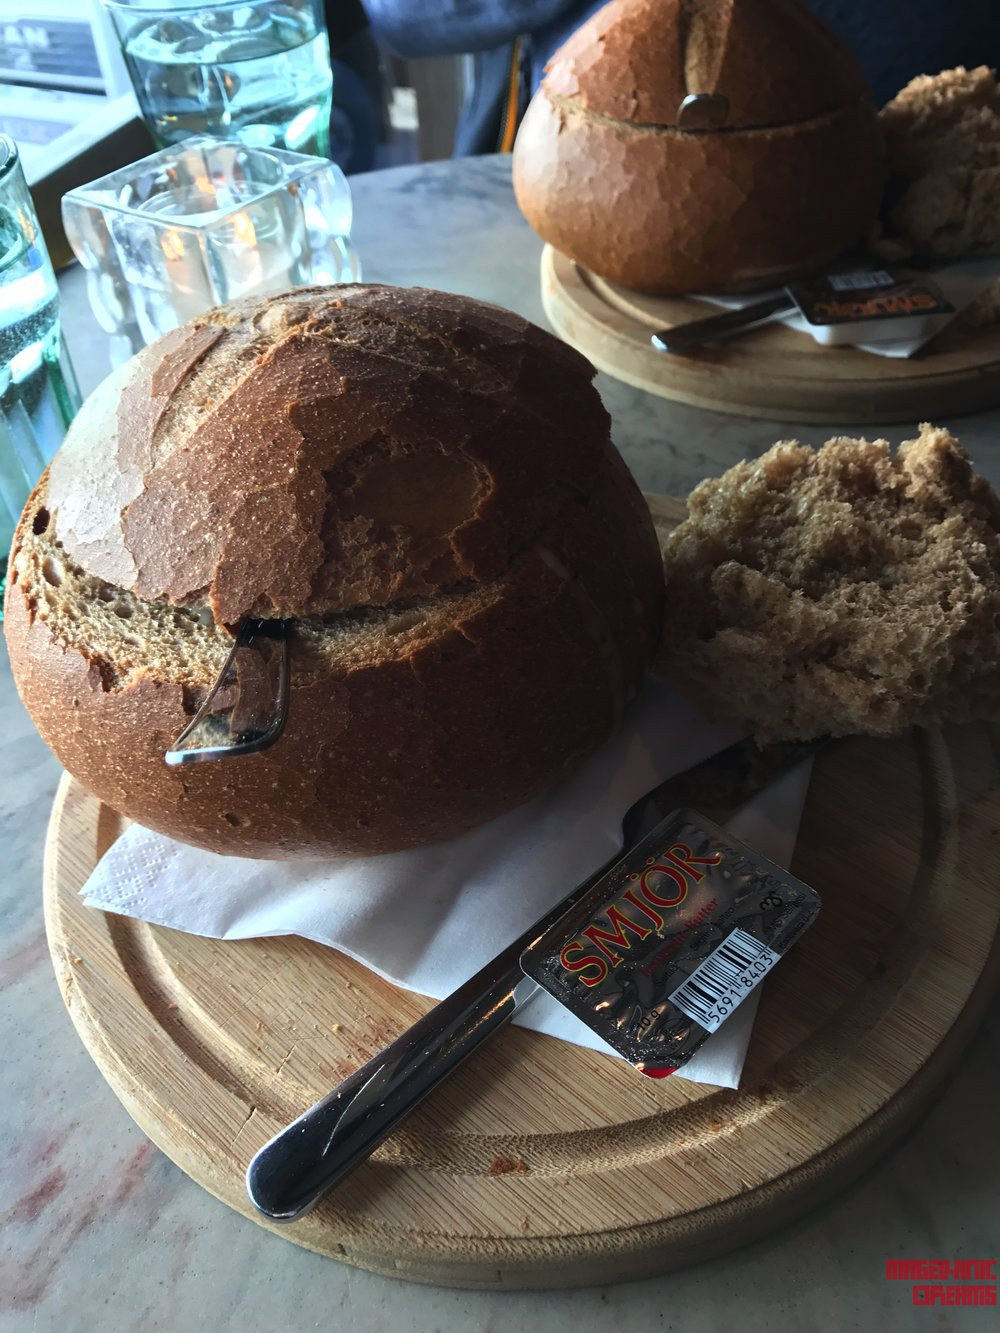 Soup in Bread at Svarta Kaffid